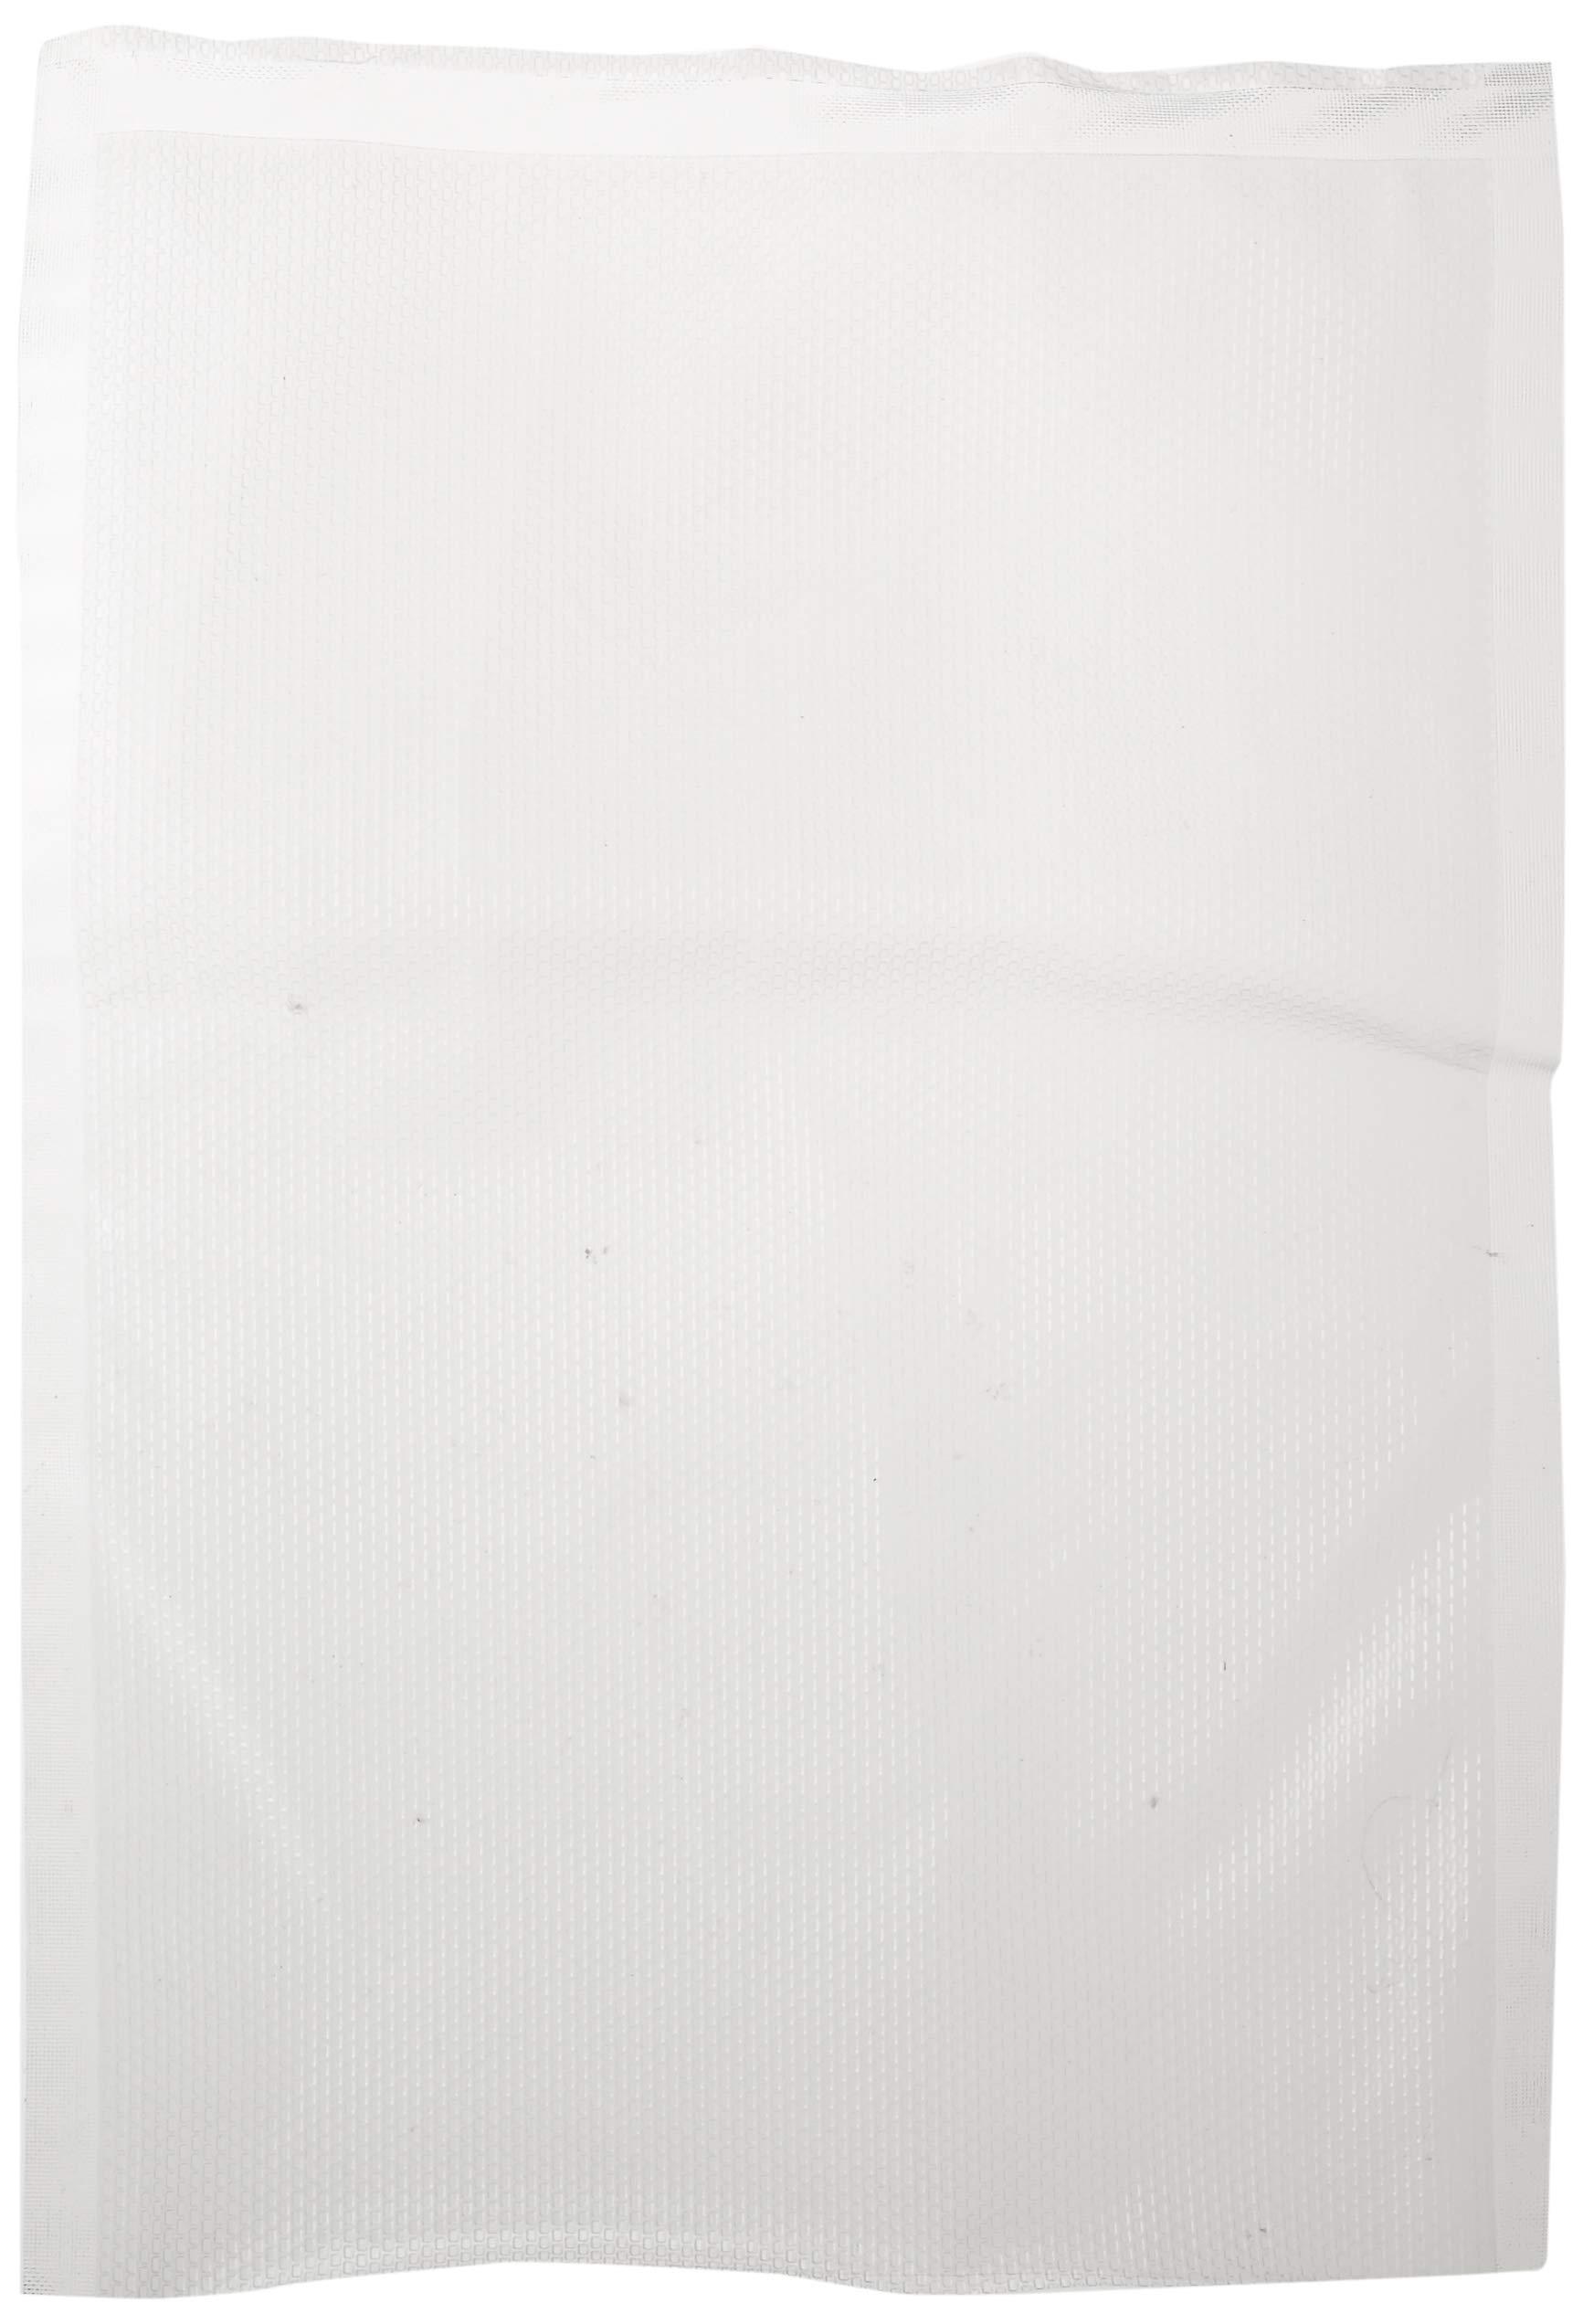 Weston Vacuum Sealer Bags, 8'' x 12'' (Quart), 66 count, Clear (30-0110-W), Pint Qty 8x12 by Weston